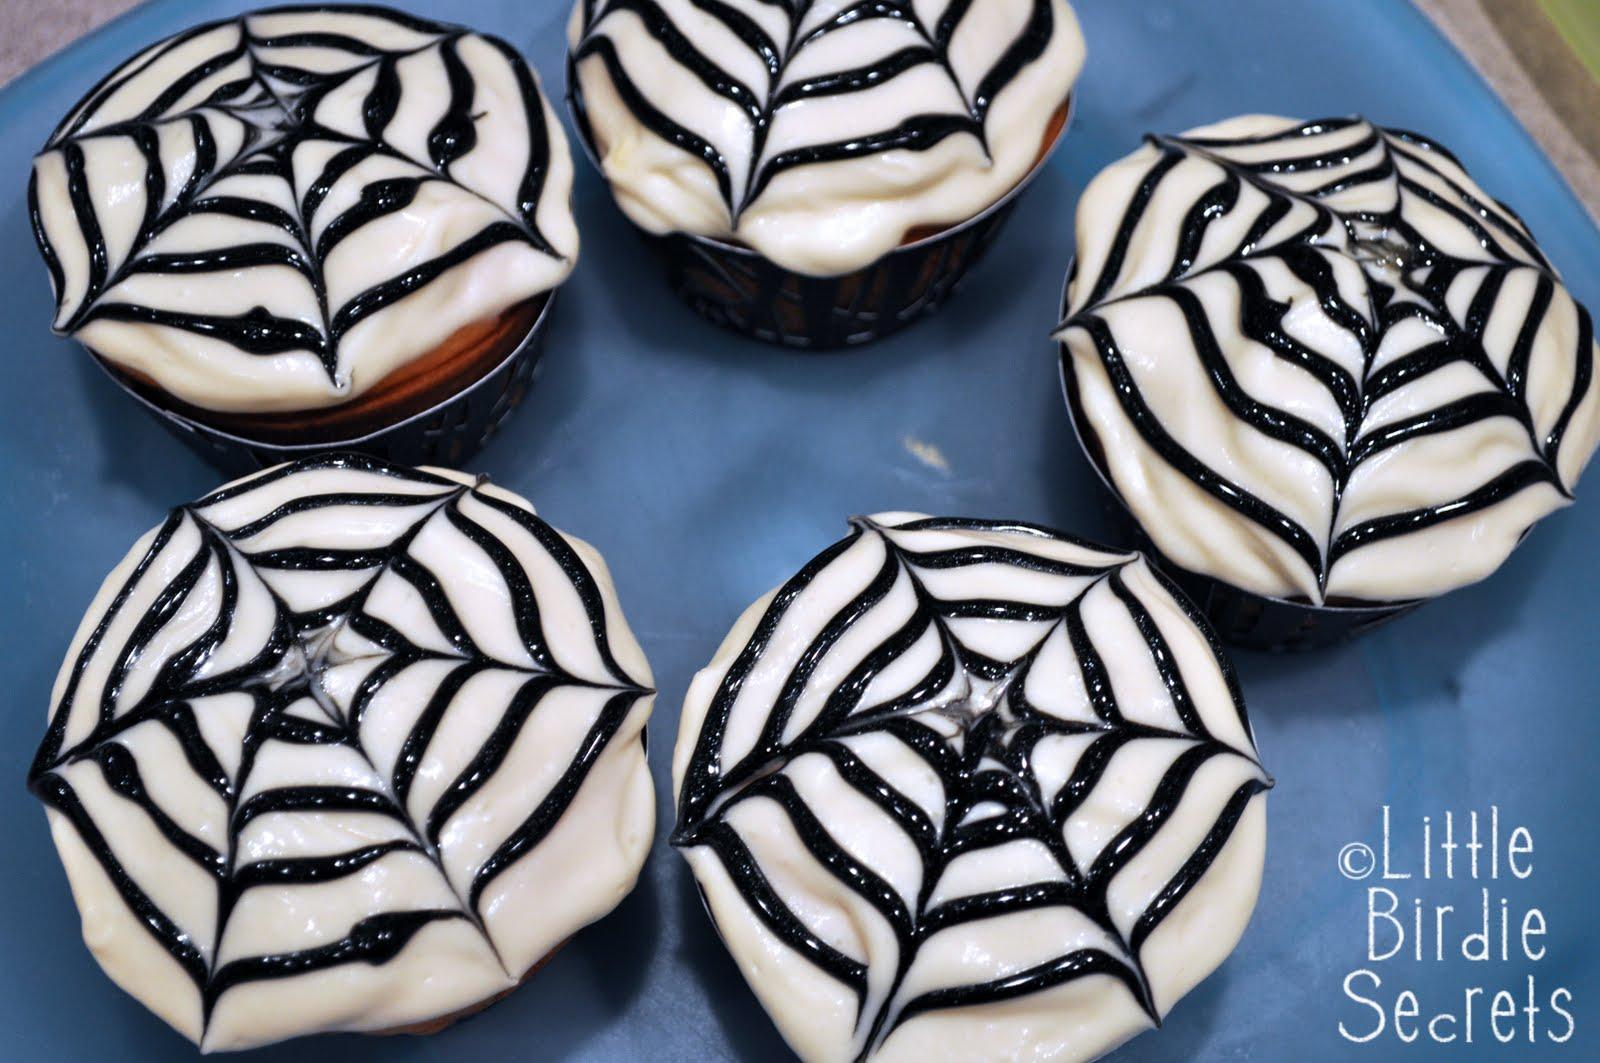 Halloween Cupcake Decorating Ideas Spider Web : halloween spider web cupcakes Little Birdie Secrets